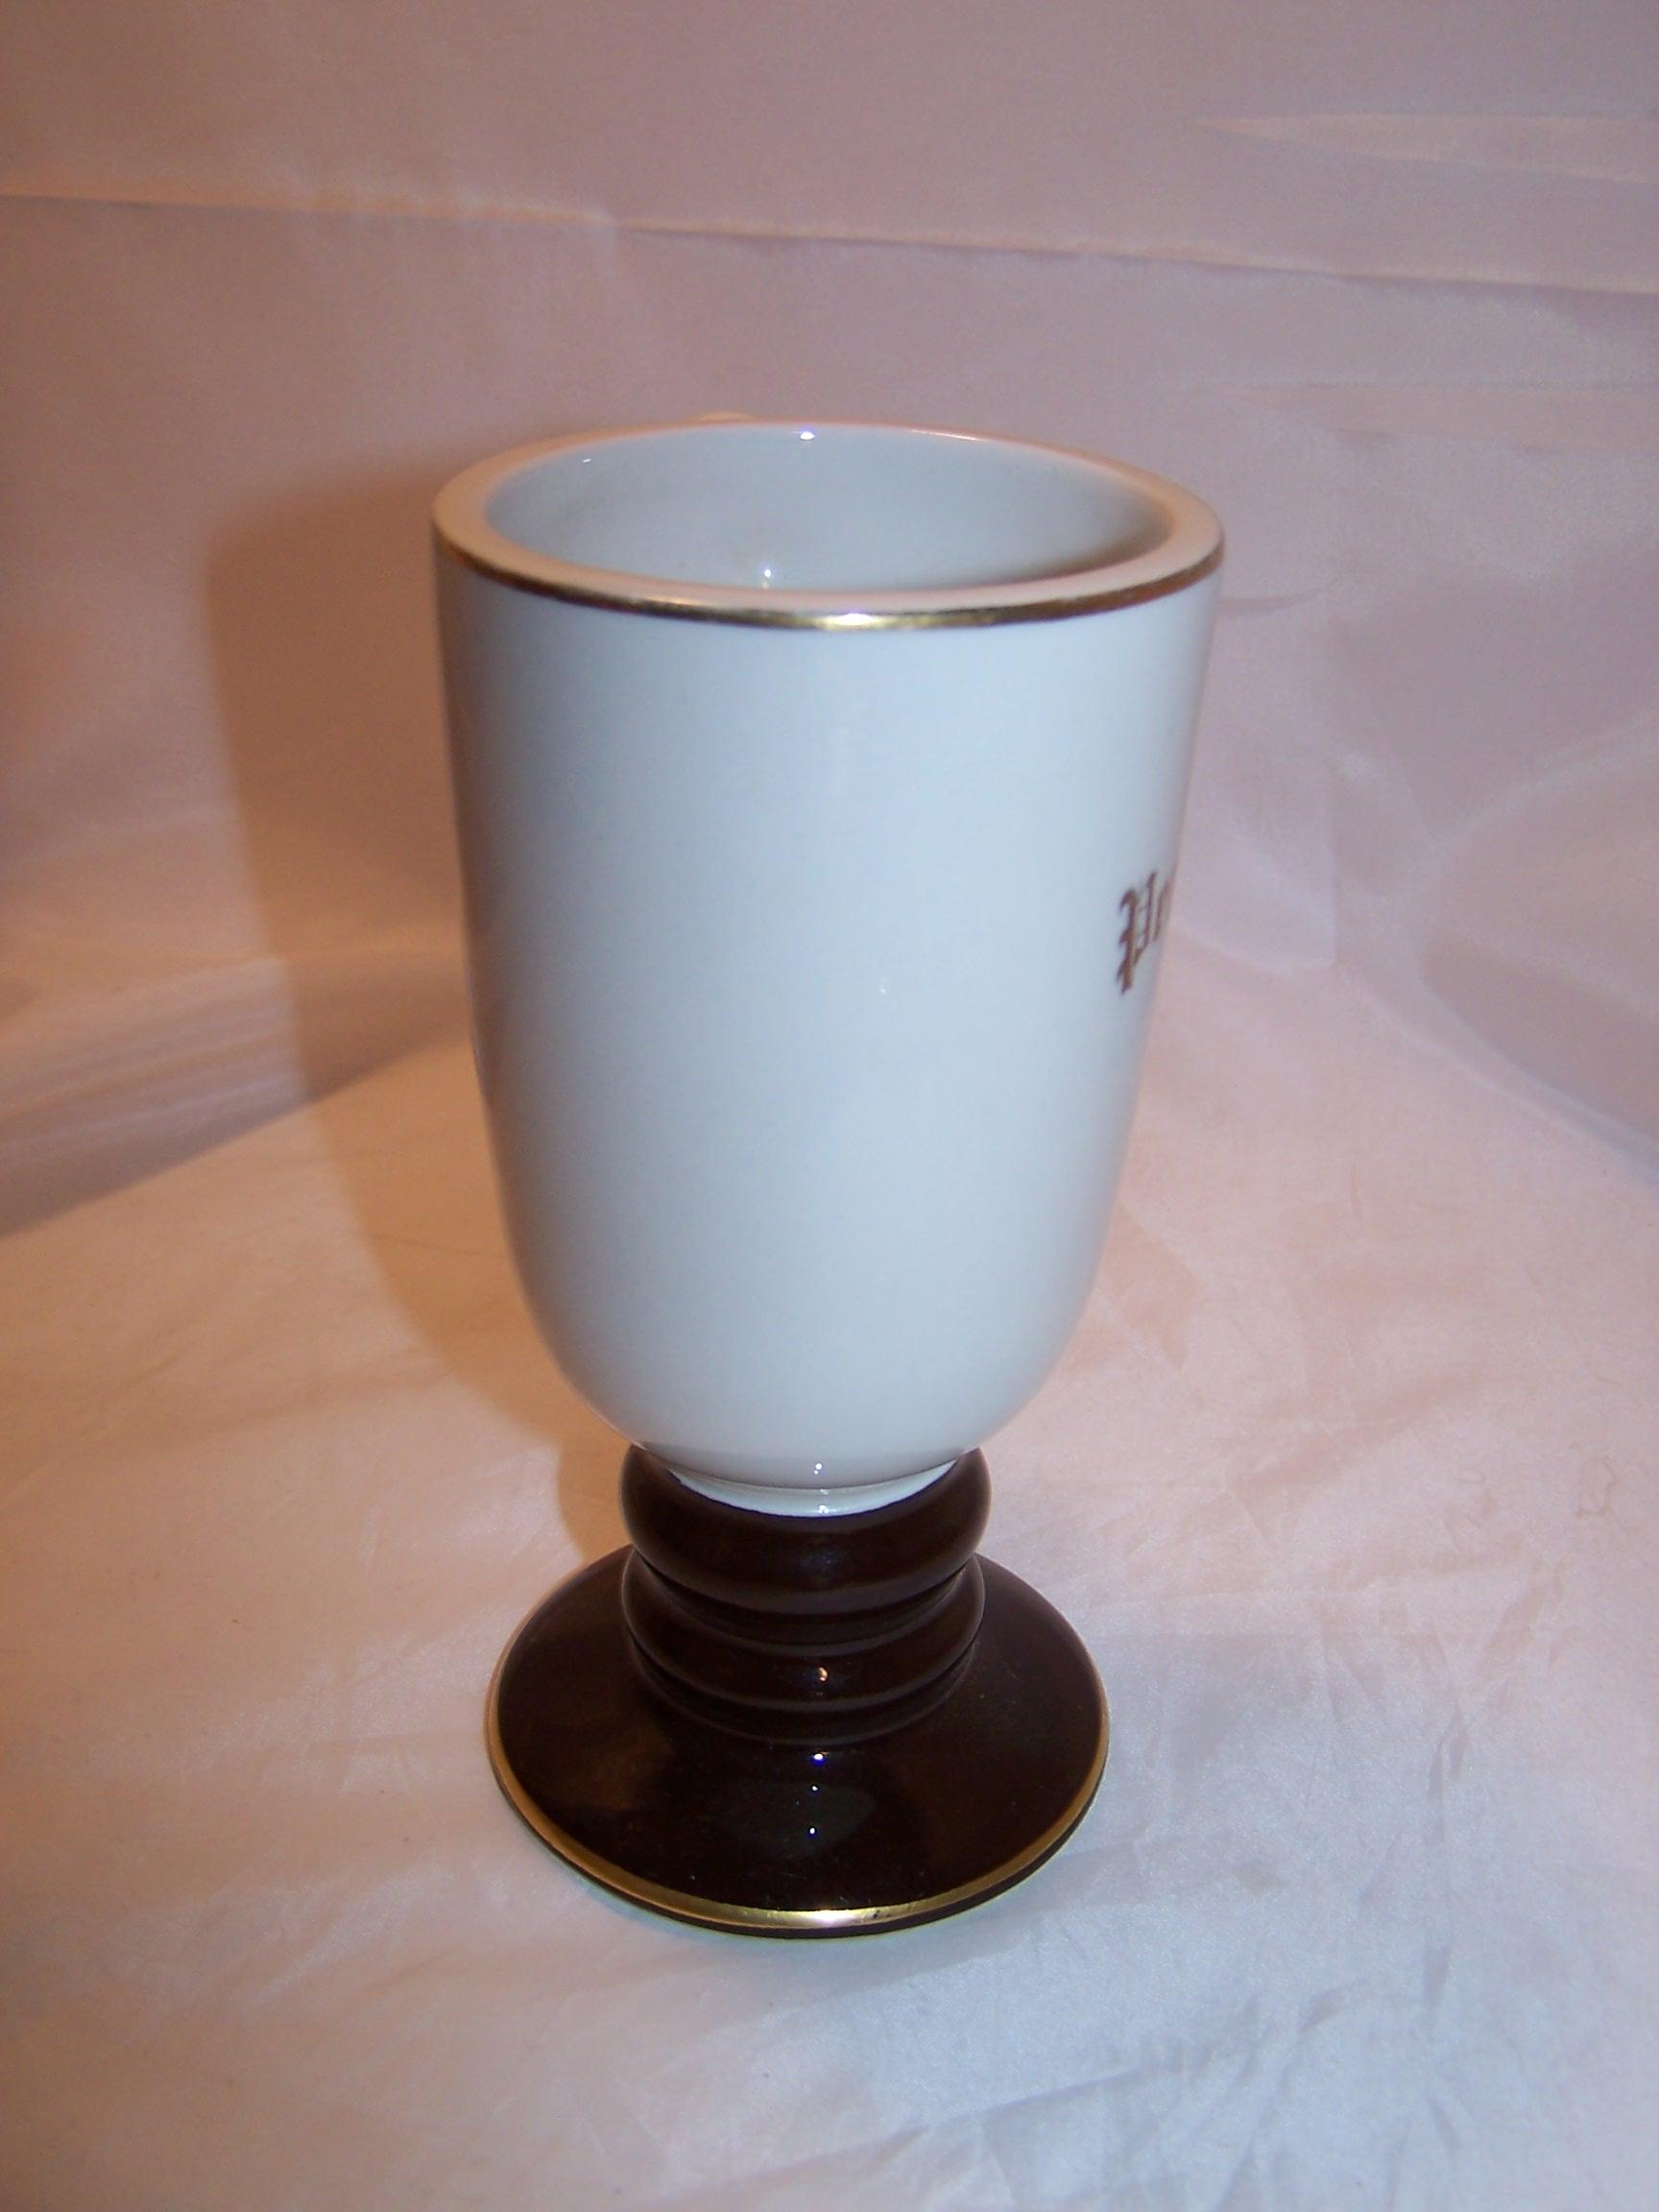 Image 3 of Bob Feller Mug, The Pewter Mug Restaurant, Vintage